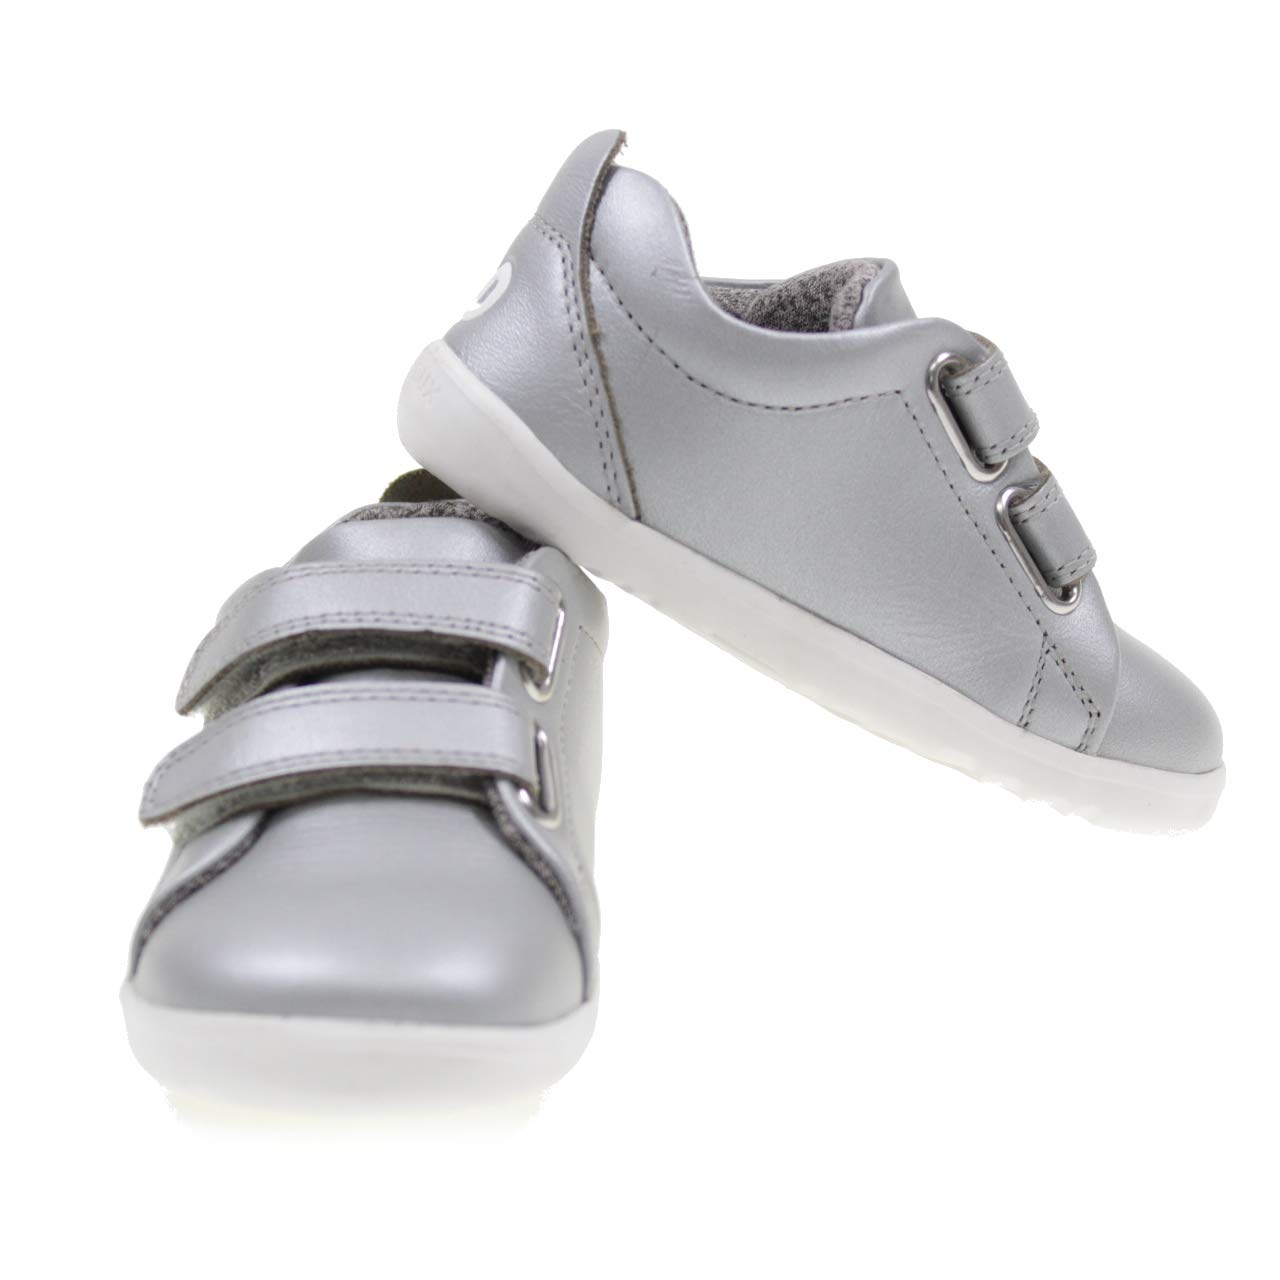 Bobux Step Up Grass Court Plata Cuero Beb/é Los Primeros Caminantes Zapatos